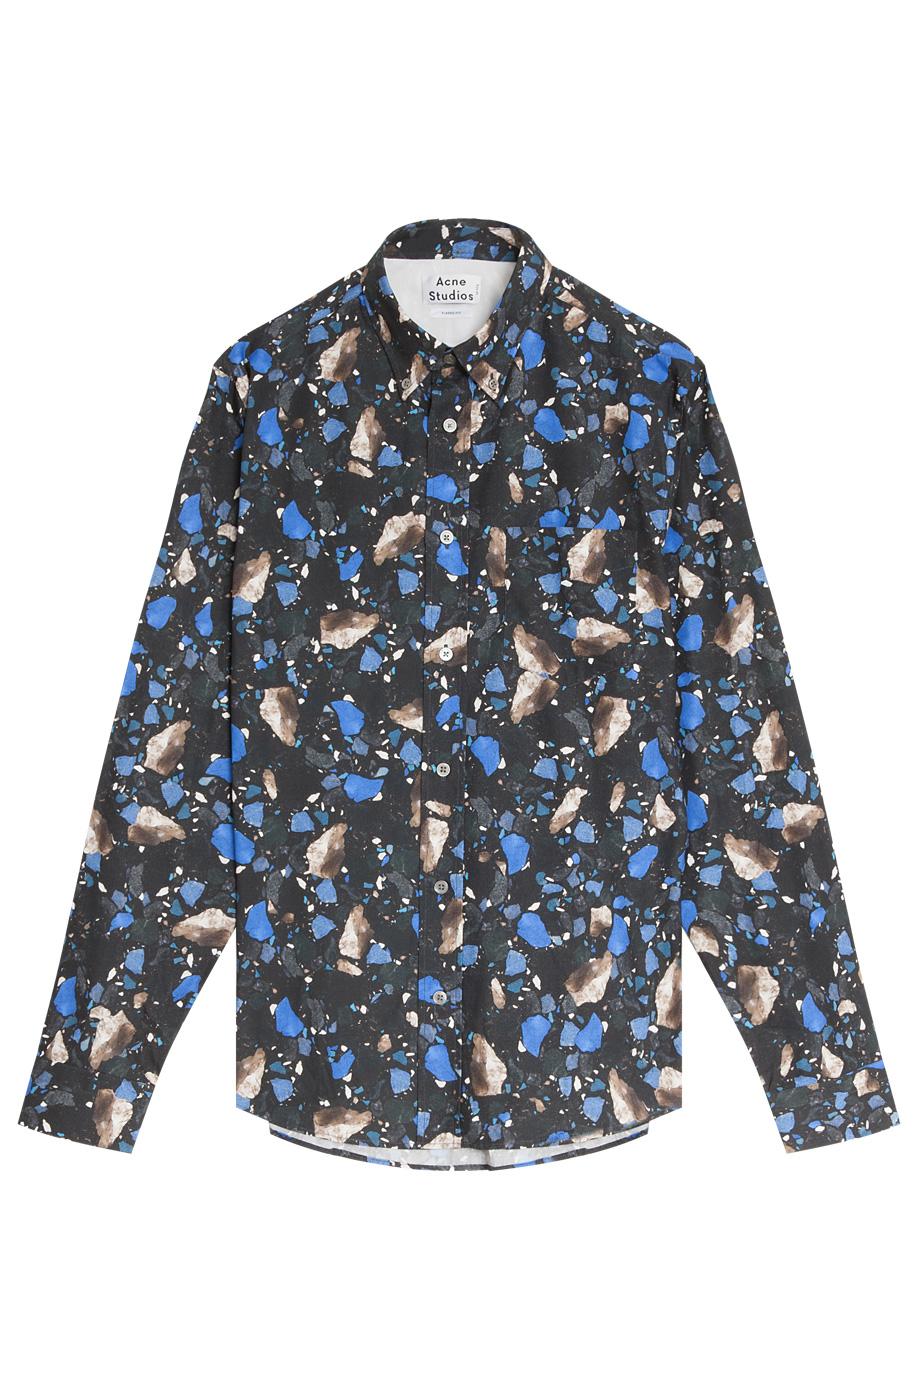 41ebaa11c1 Lyst - Acne Studios Isherwood Marble Print Shirt in Blue for Men